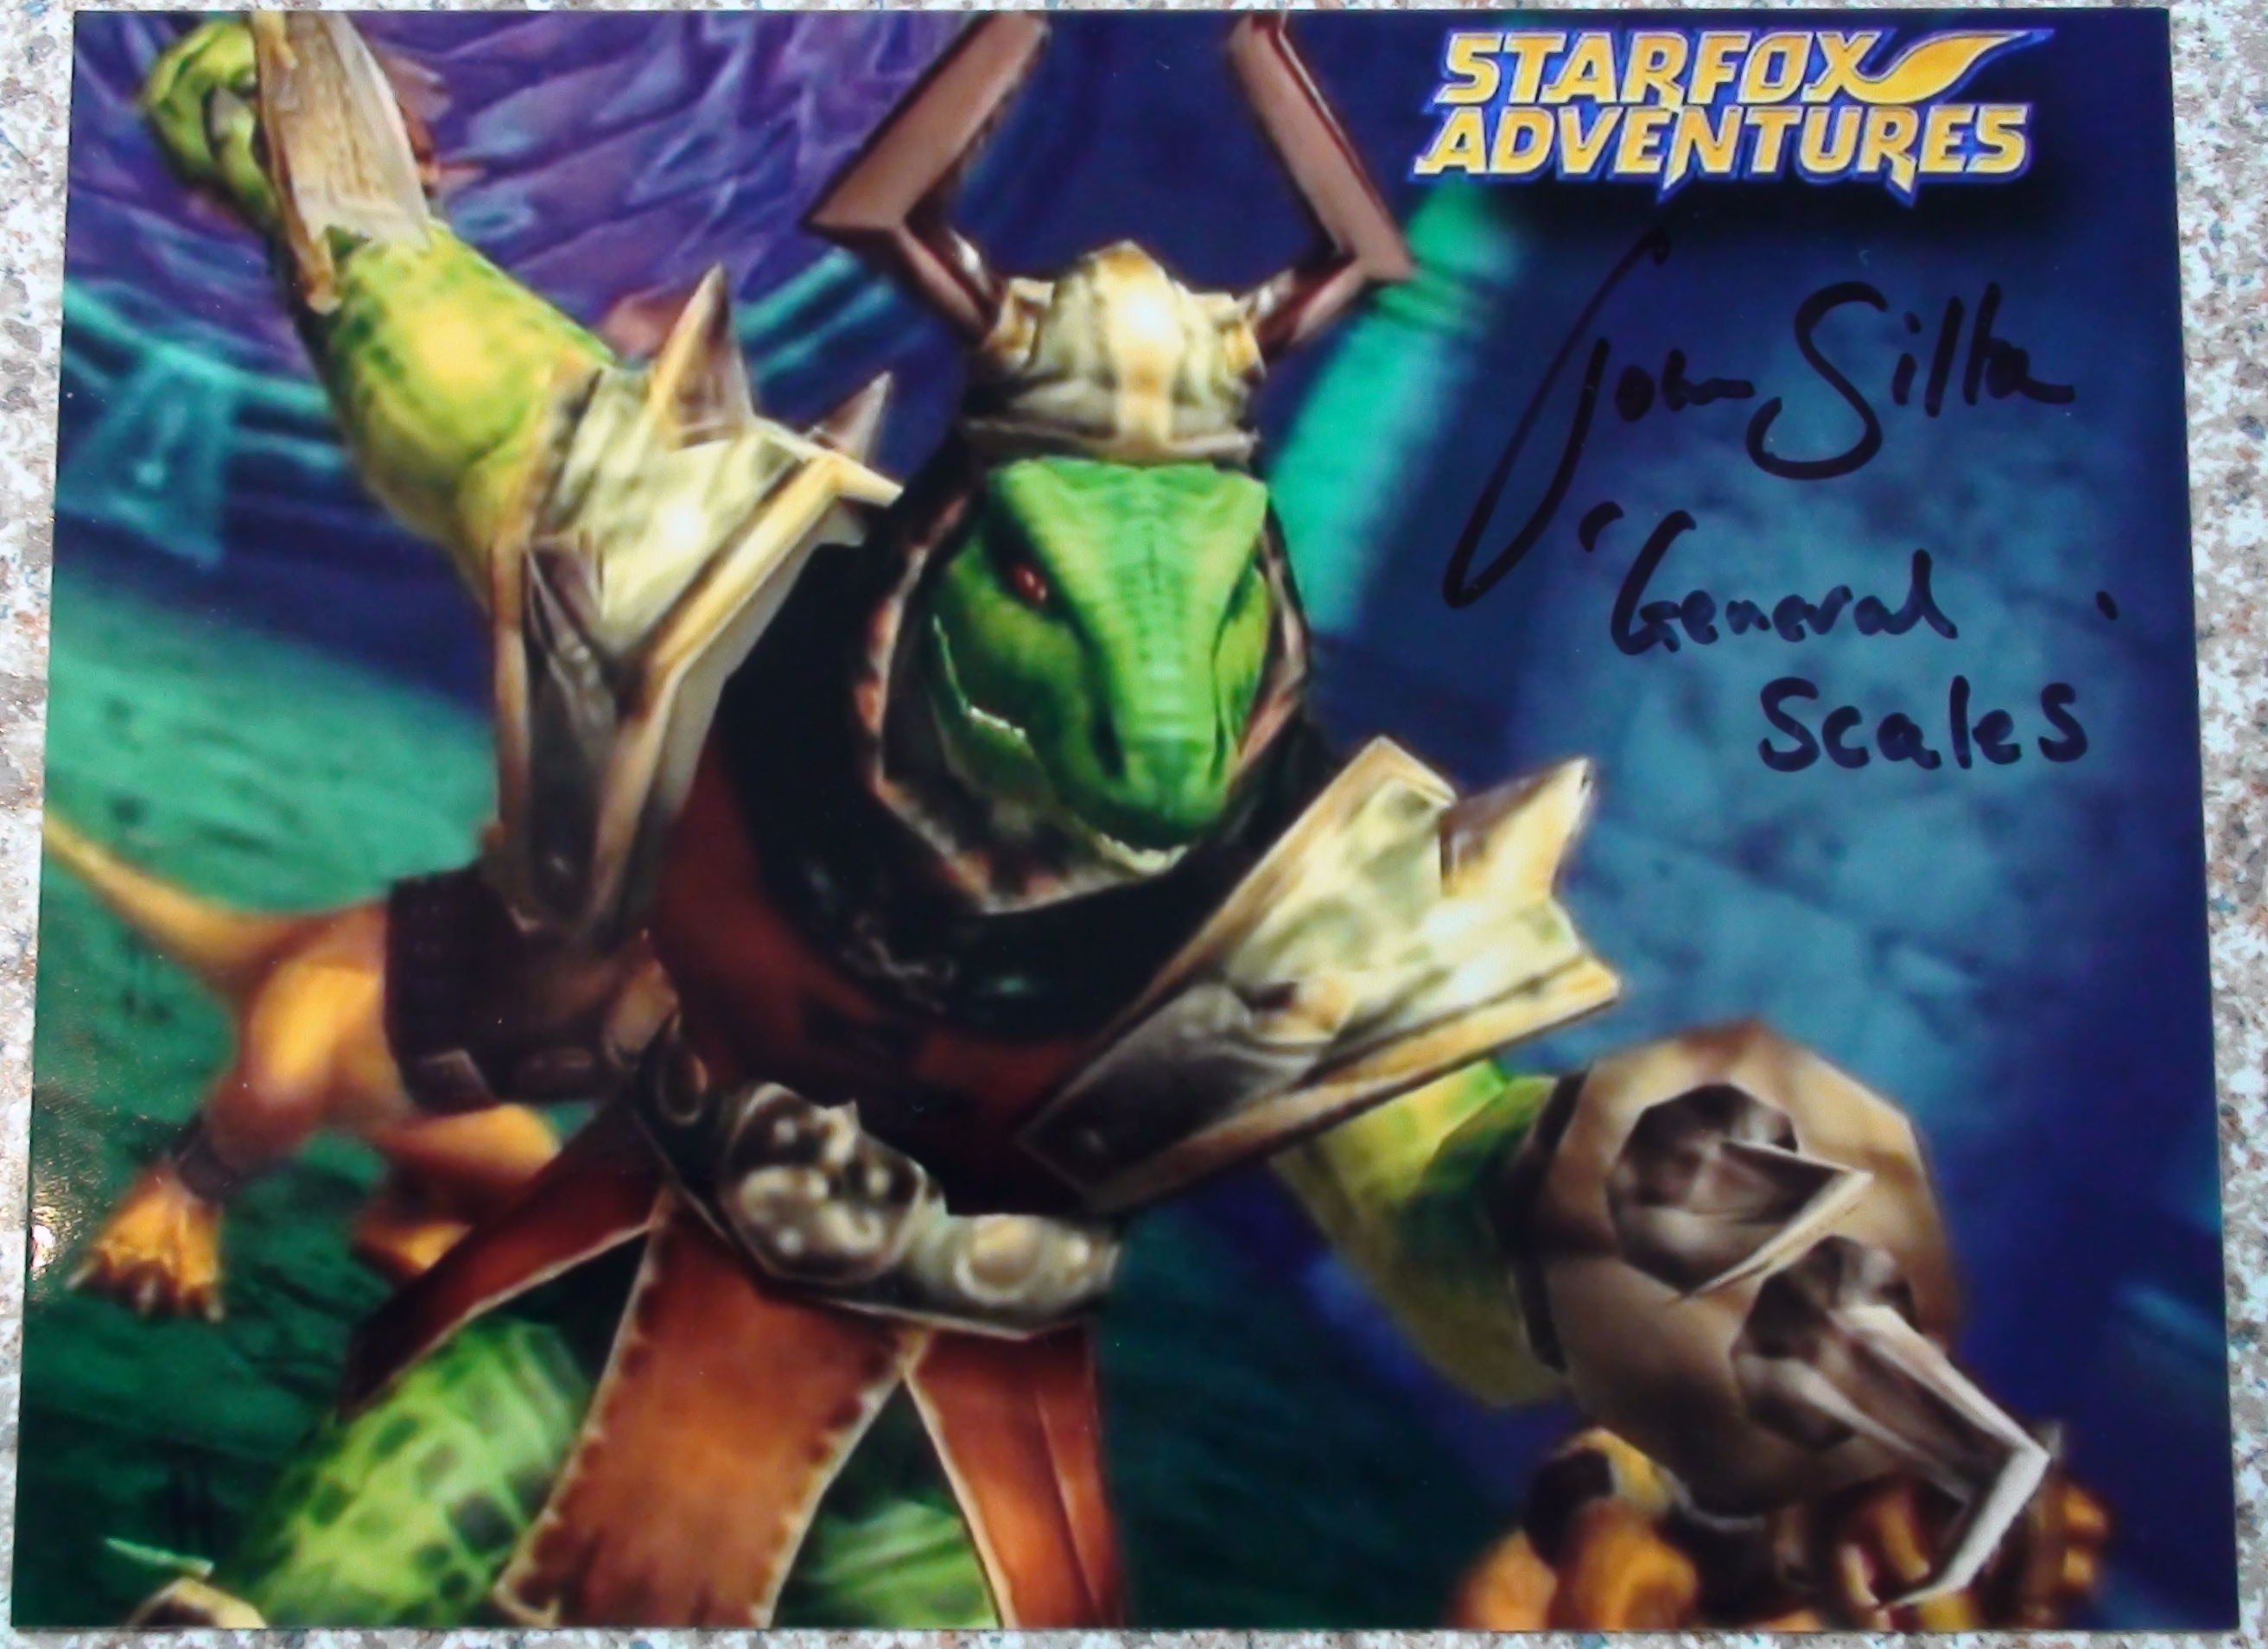 StarFox Adventures - John Silke